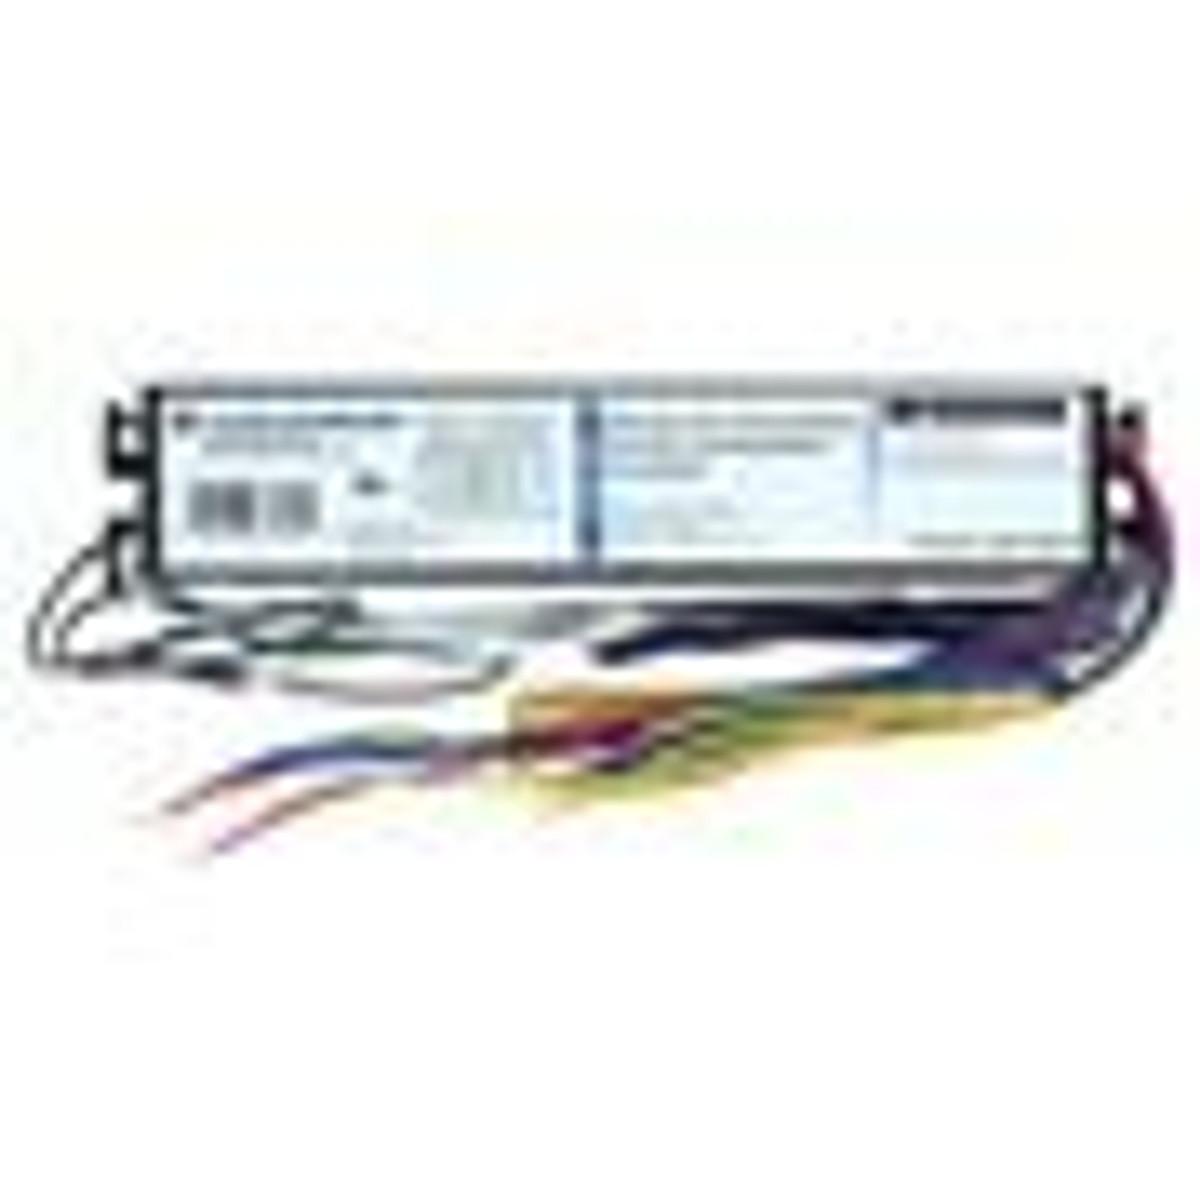 LumeGen Electrical